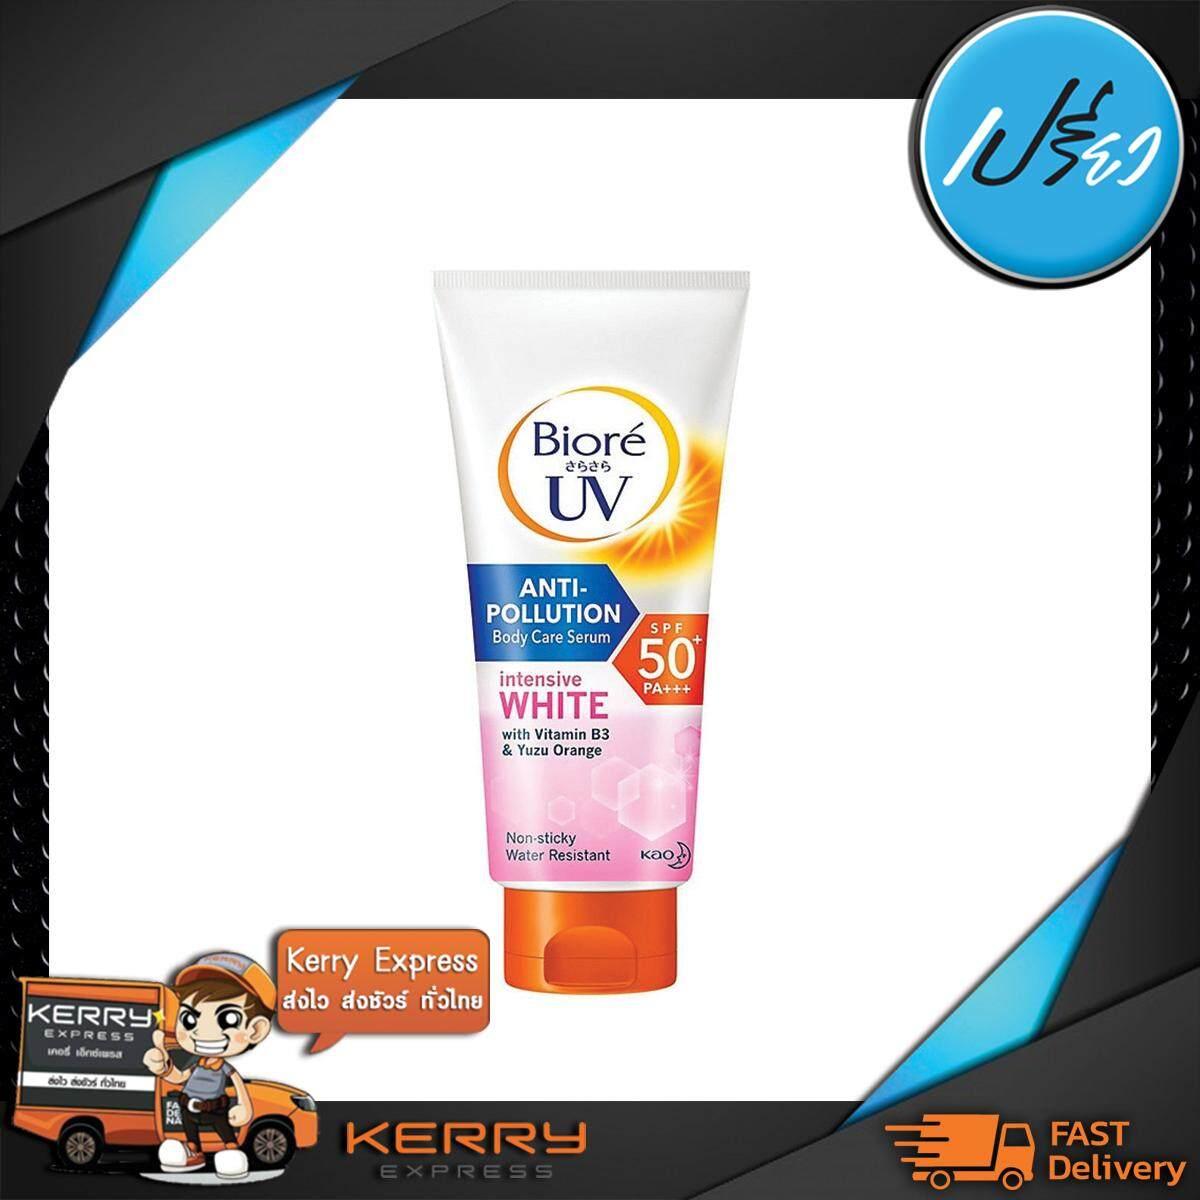 Biore UV Anti Pollution Body Care Serum Intensive White SPF50+ PA+++ กันแดดสำหรับผิวกาย 150 มล.